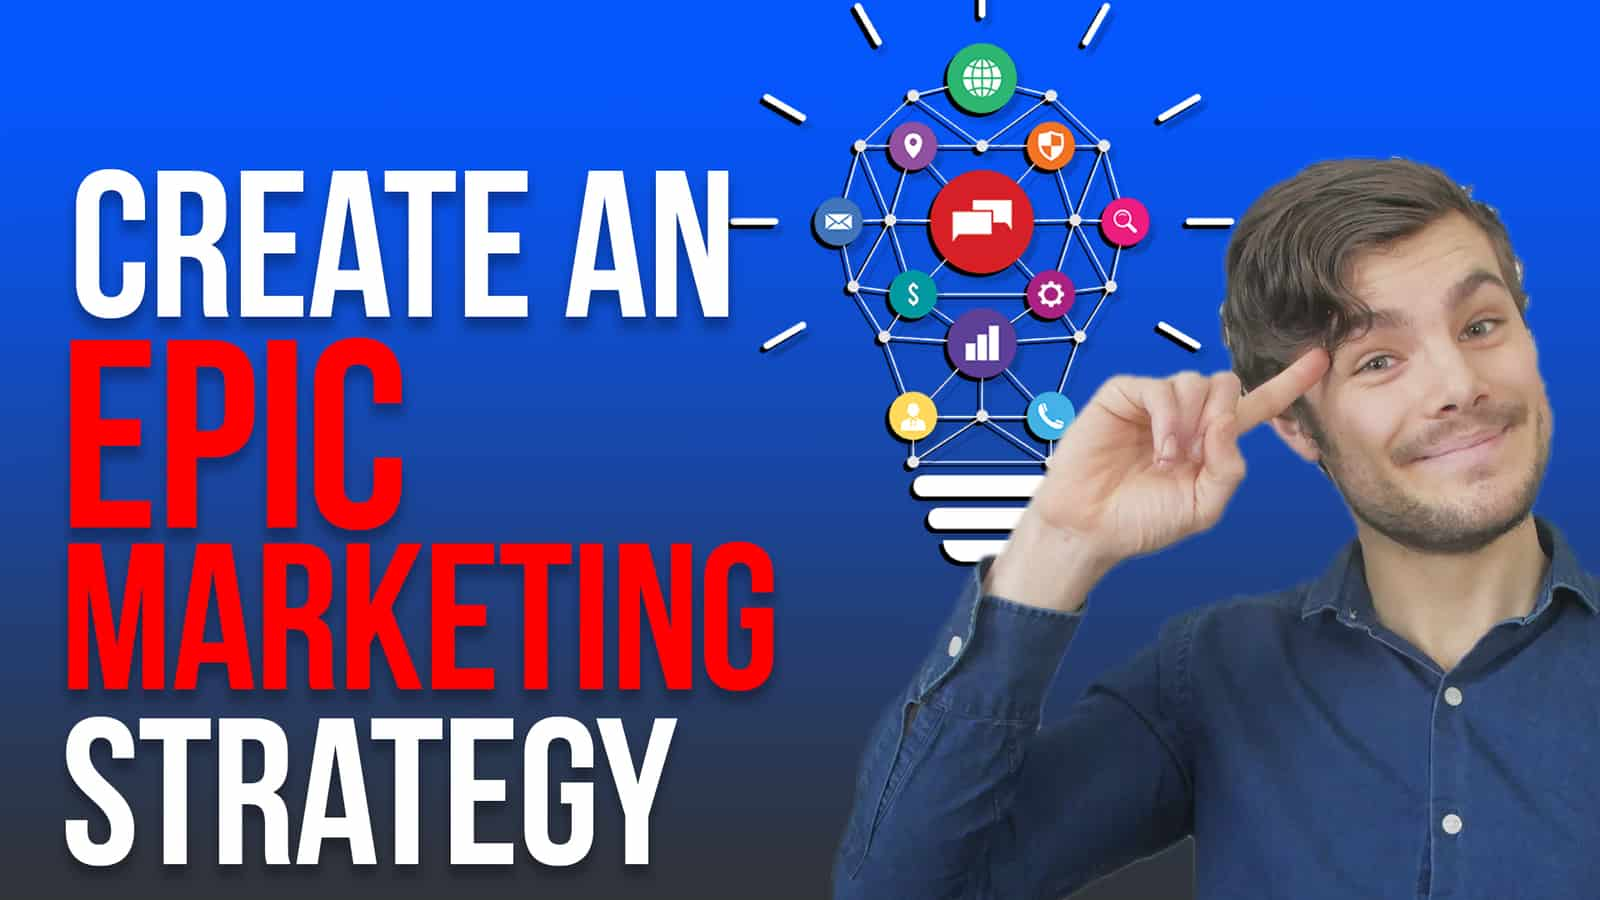 create an epic marketing strategy lightbulb